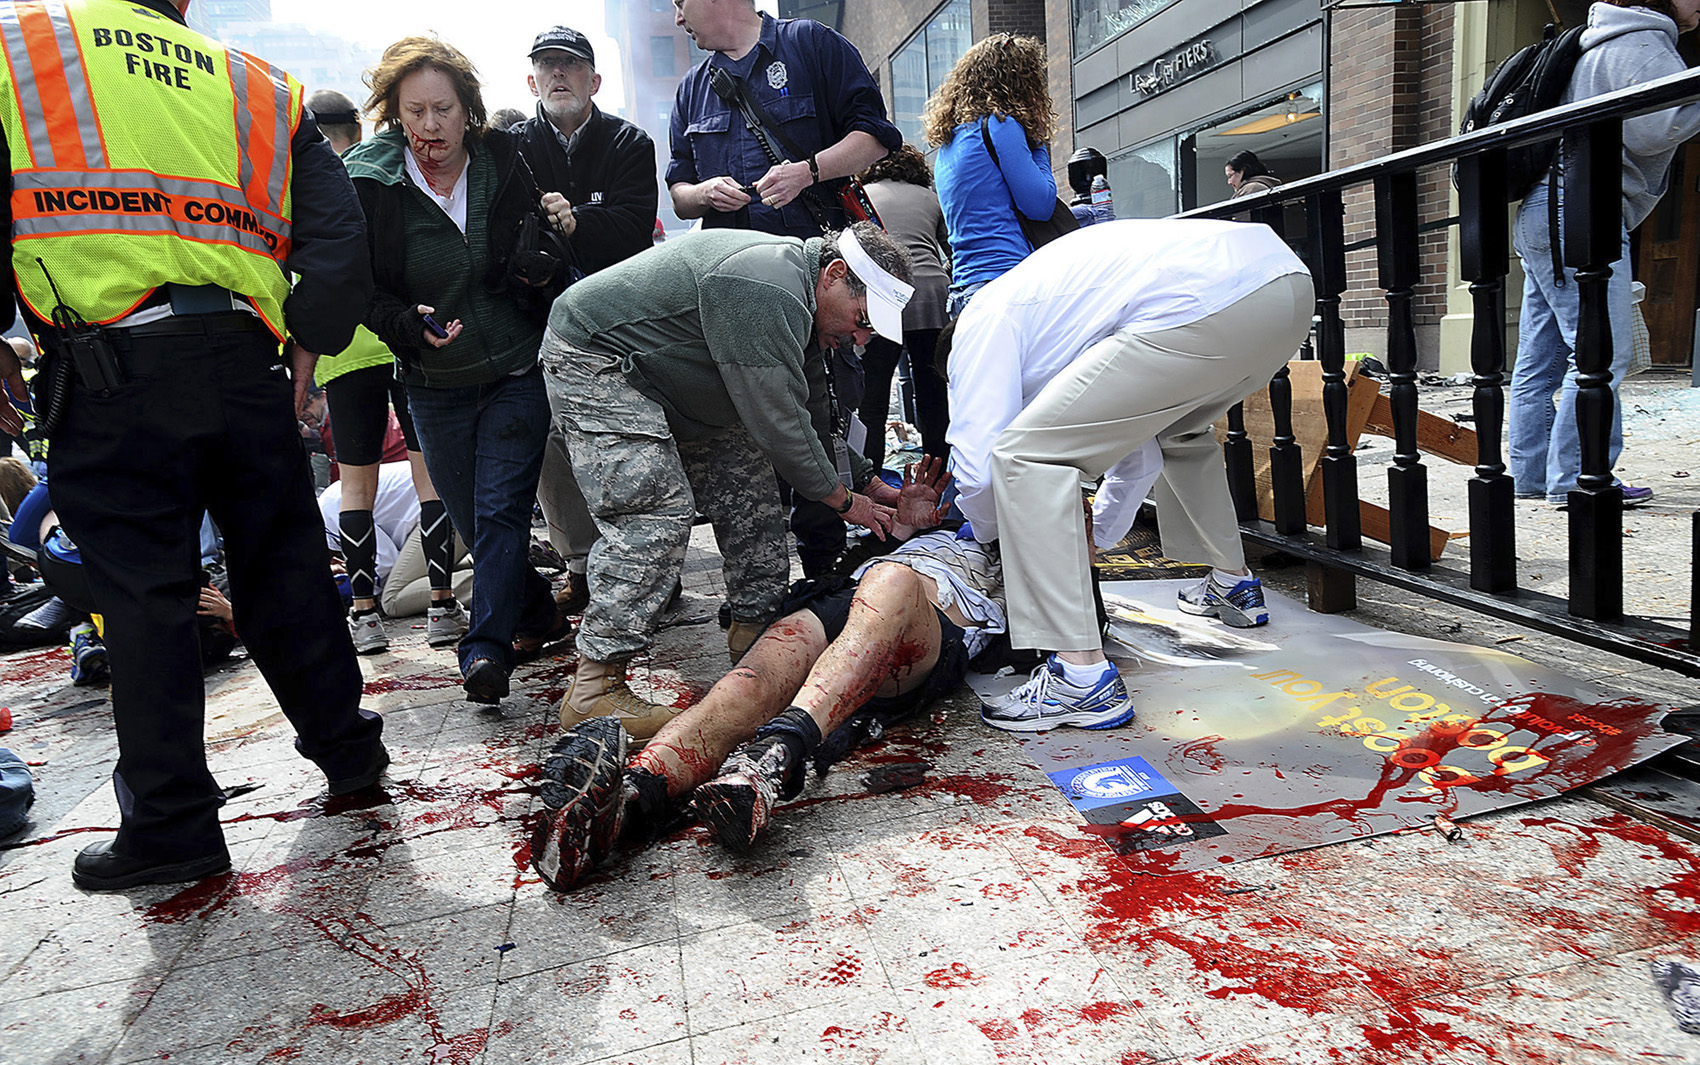 Ferido recebe atendimento logo após explosão na Maratona de Boston.